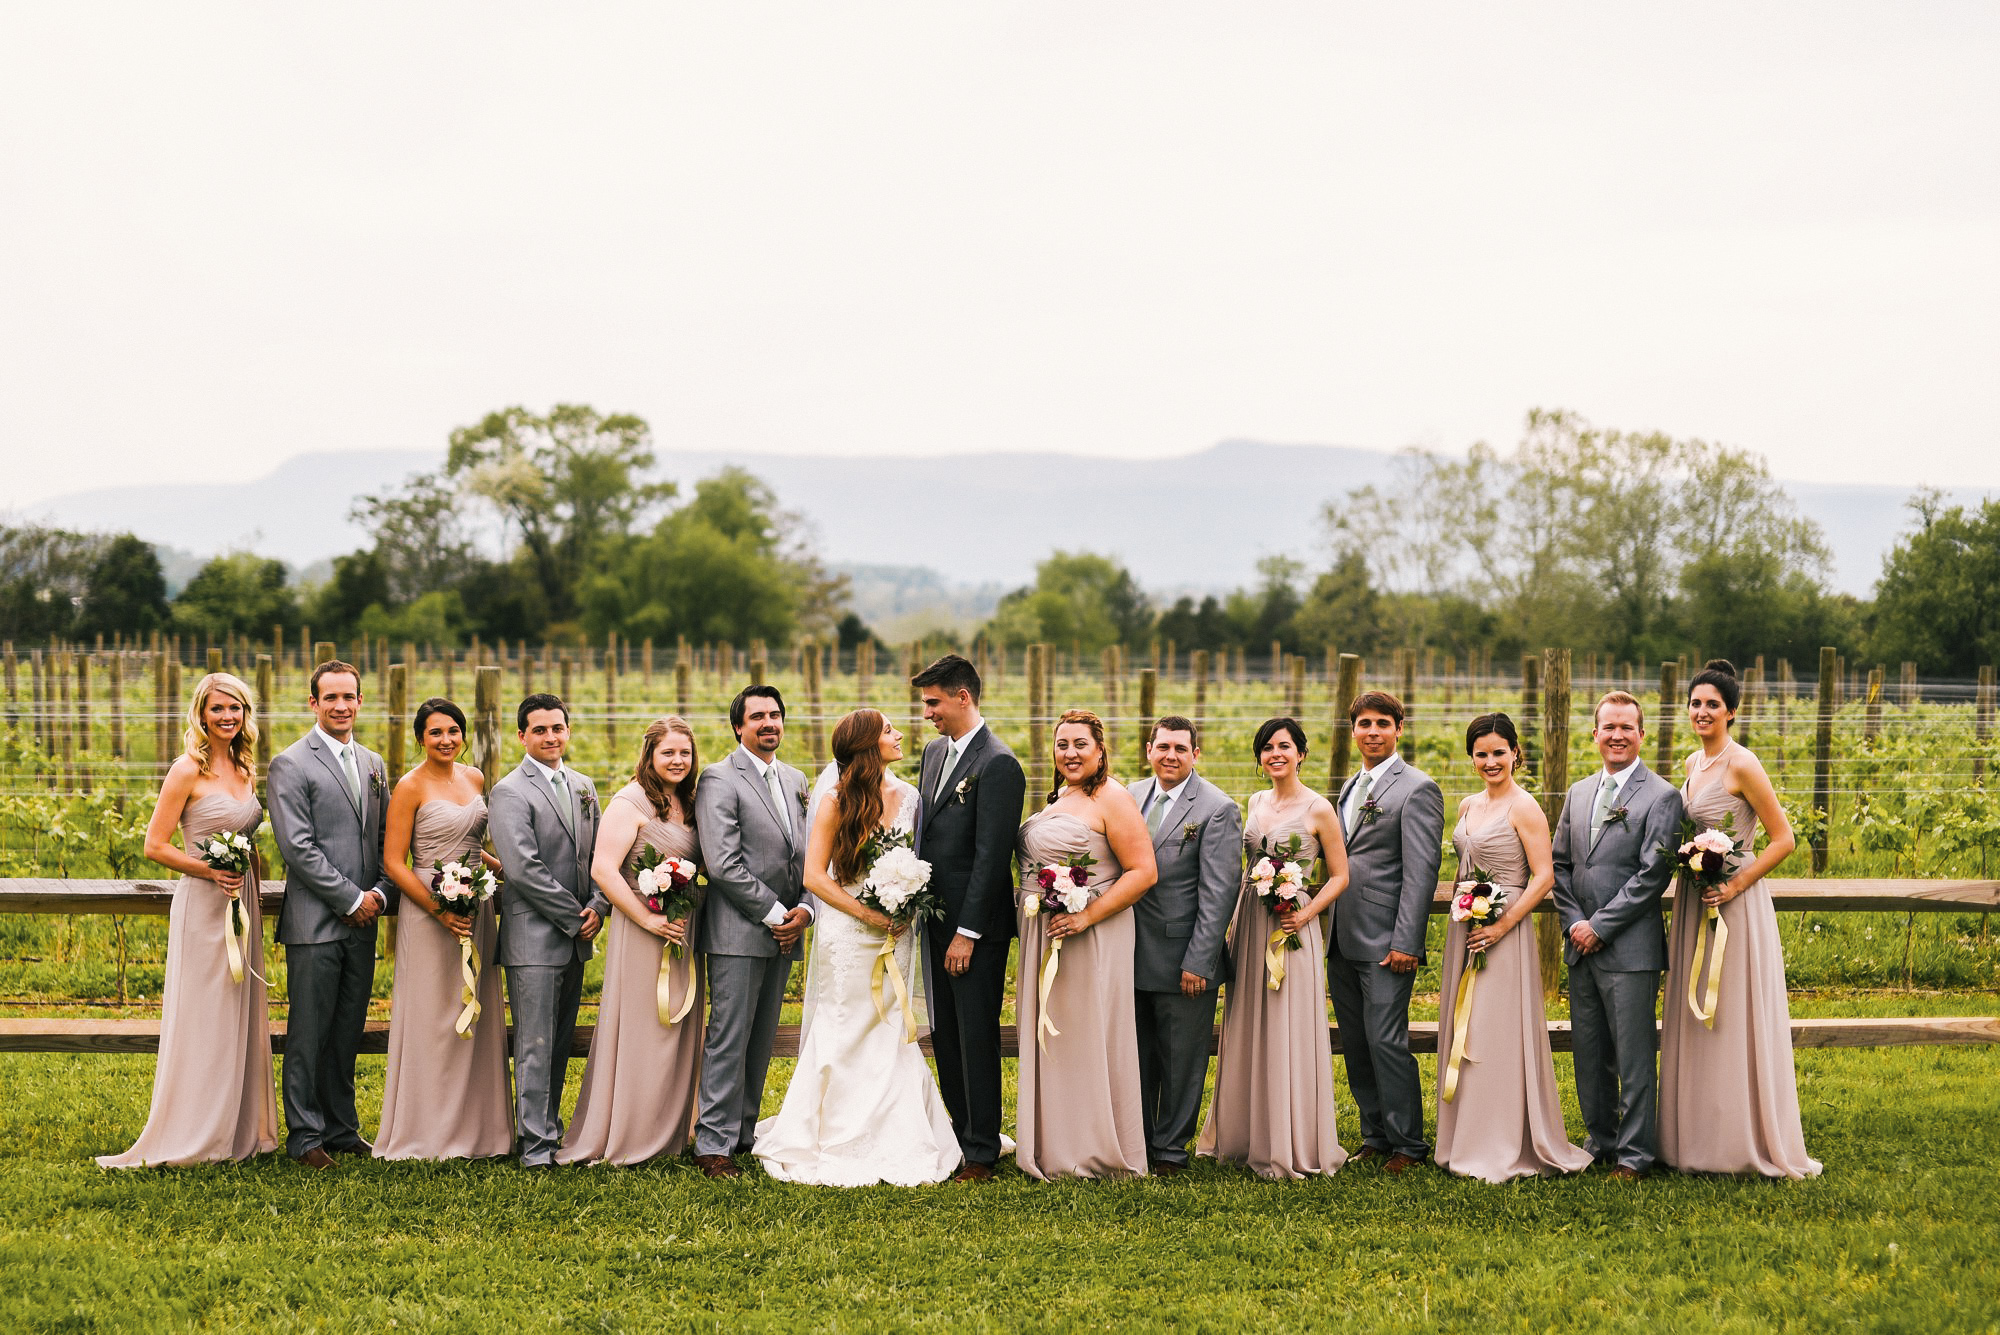 wedding-photography-virginia_0043.jpg